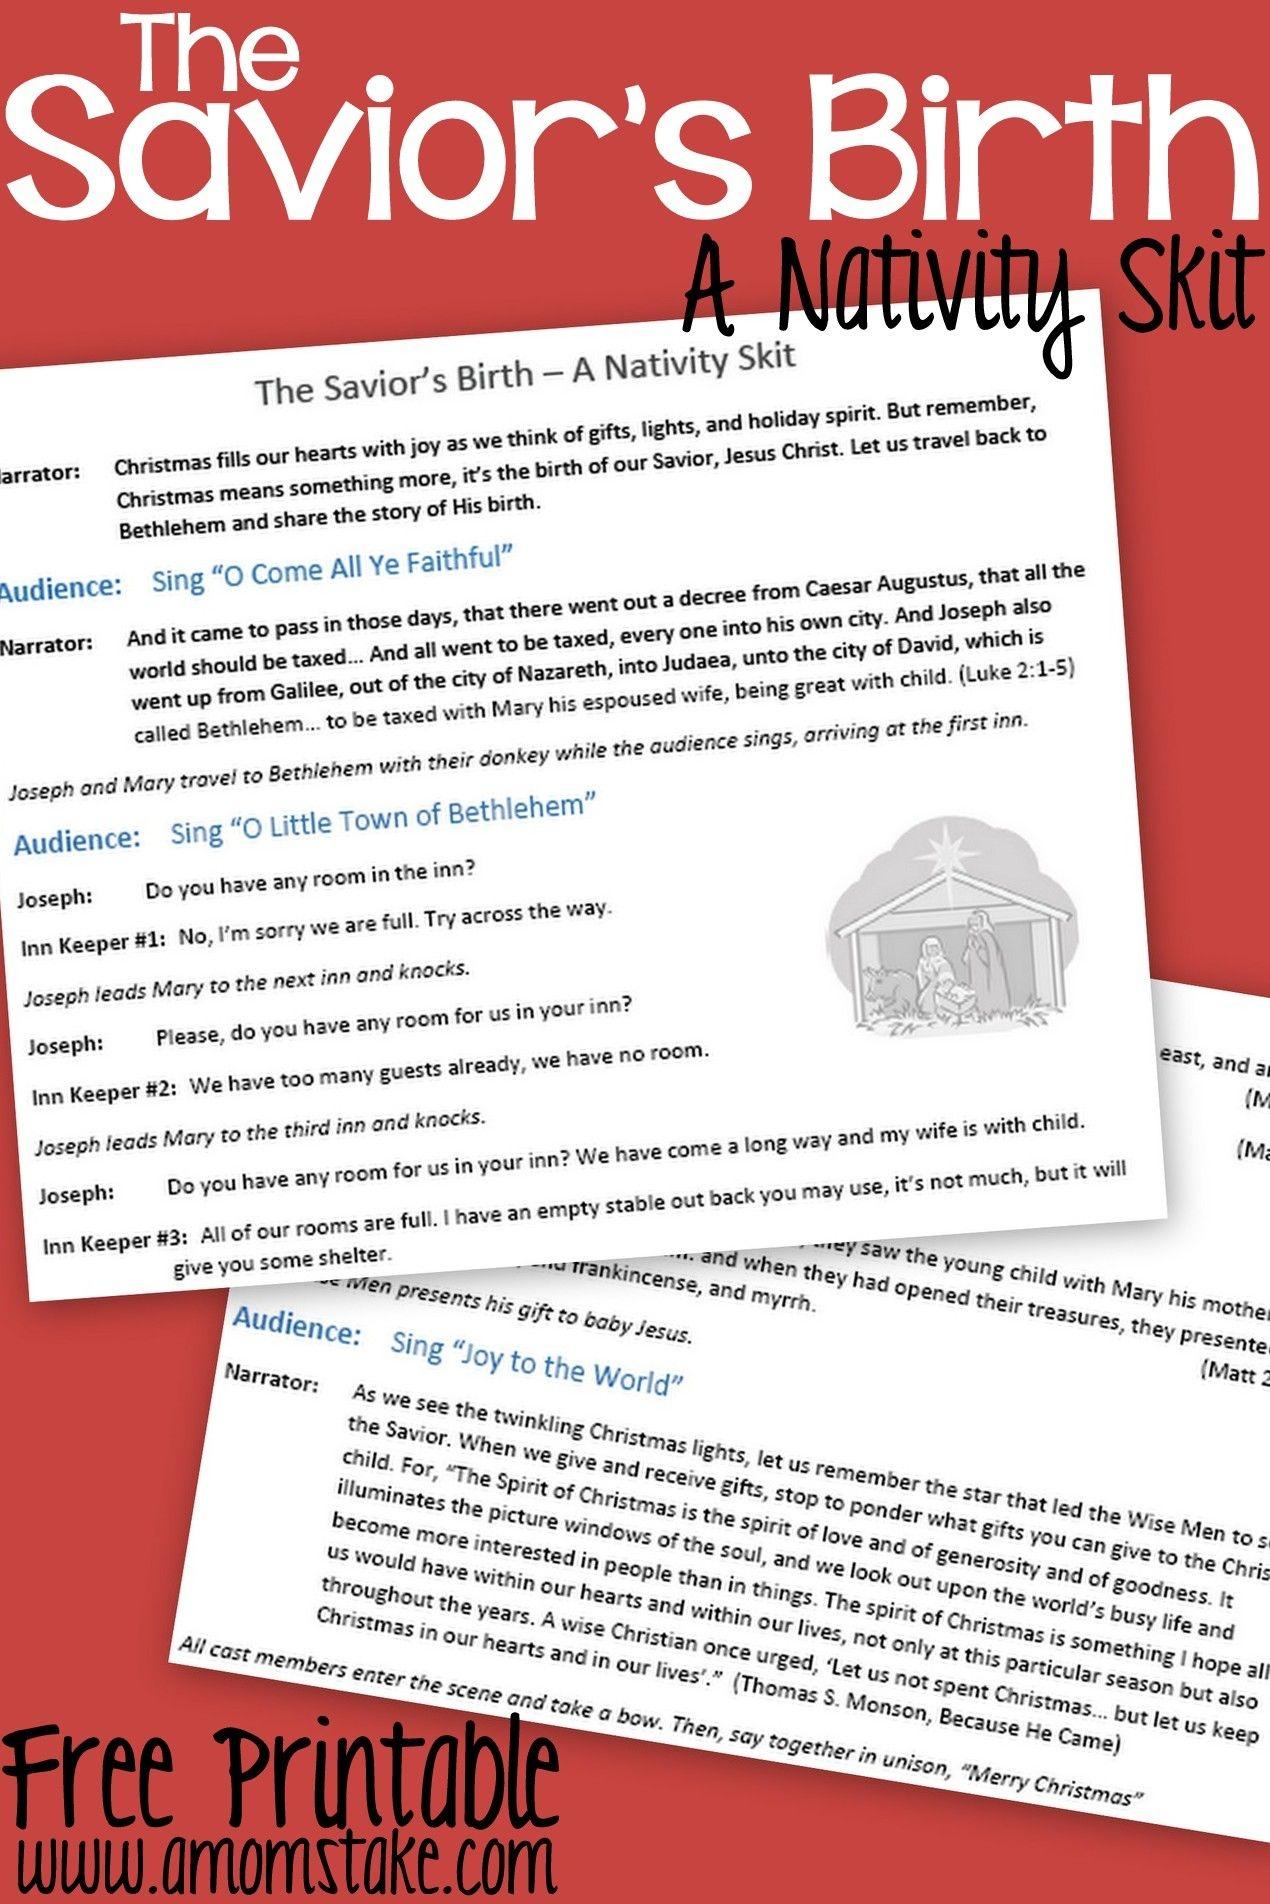 Free Printable Nativity Skit To Act Out The Birth Of The Savior - Free Printable Christmas Plays For Sunday School